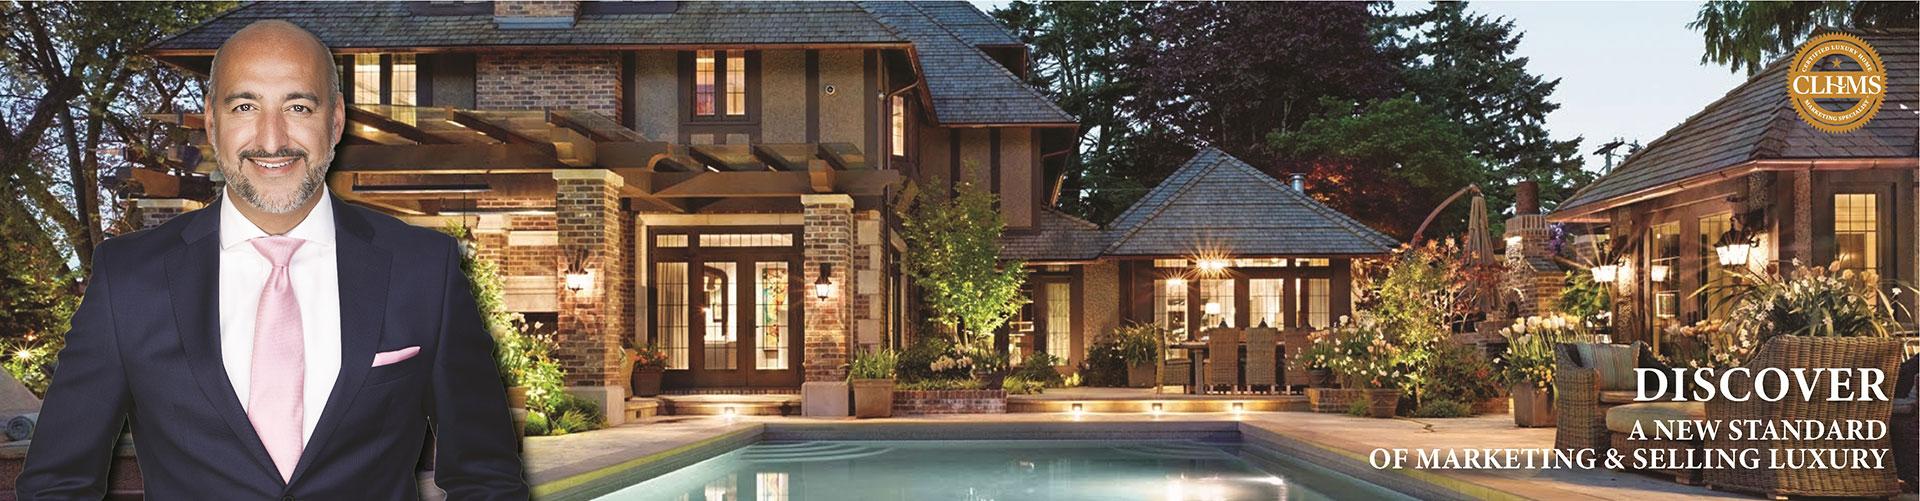 Top Luxury CLHMS - SRES - CNE - ABR - SRS Real Estate Broker Joseph Azimi In Toronto Vaughan Kleinburg Oakville Mississauga Brampton Milton Caledon Etobicoke Markham Richmond Hill Joseph Azimi, Broker 3